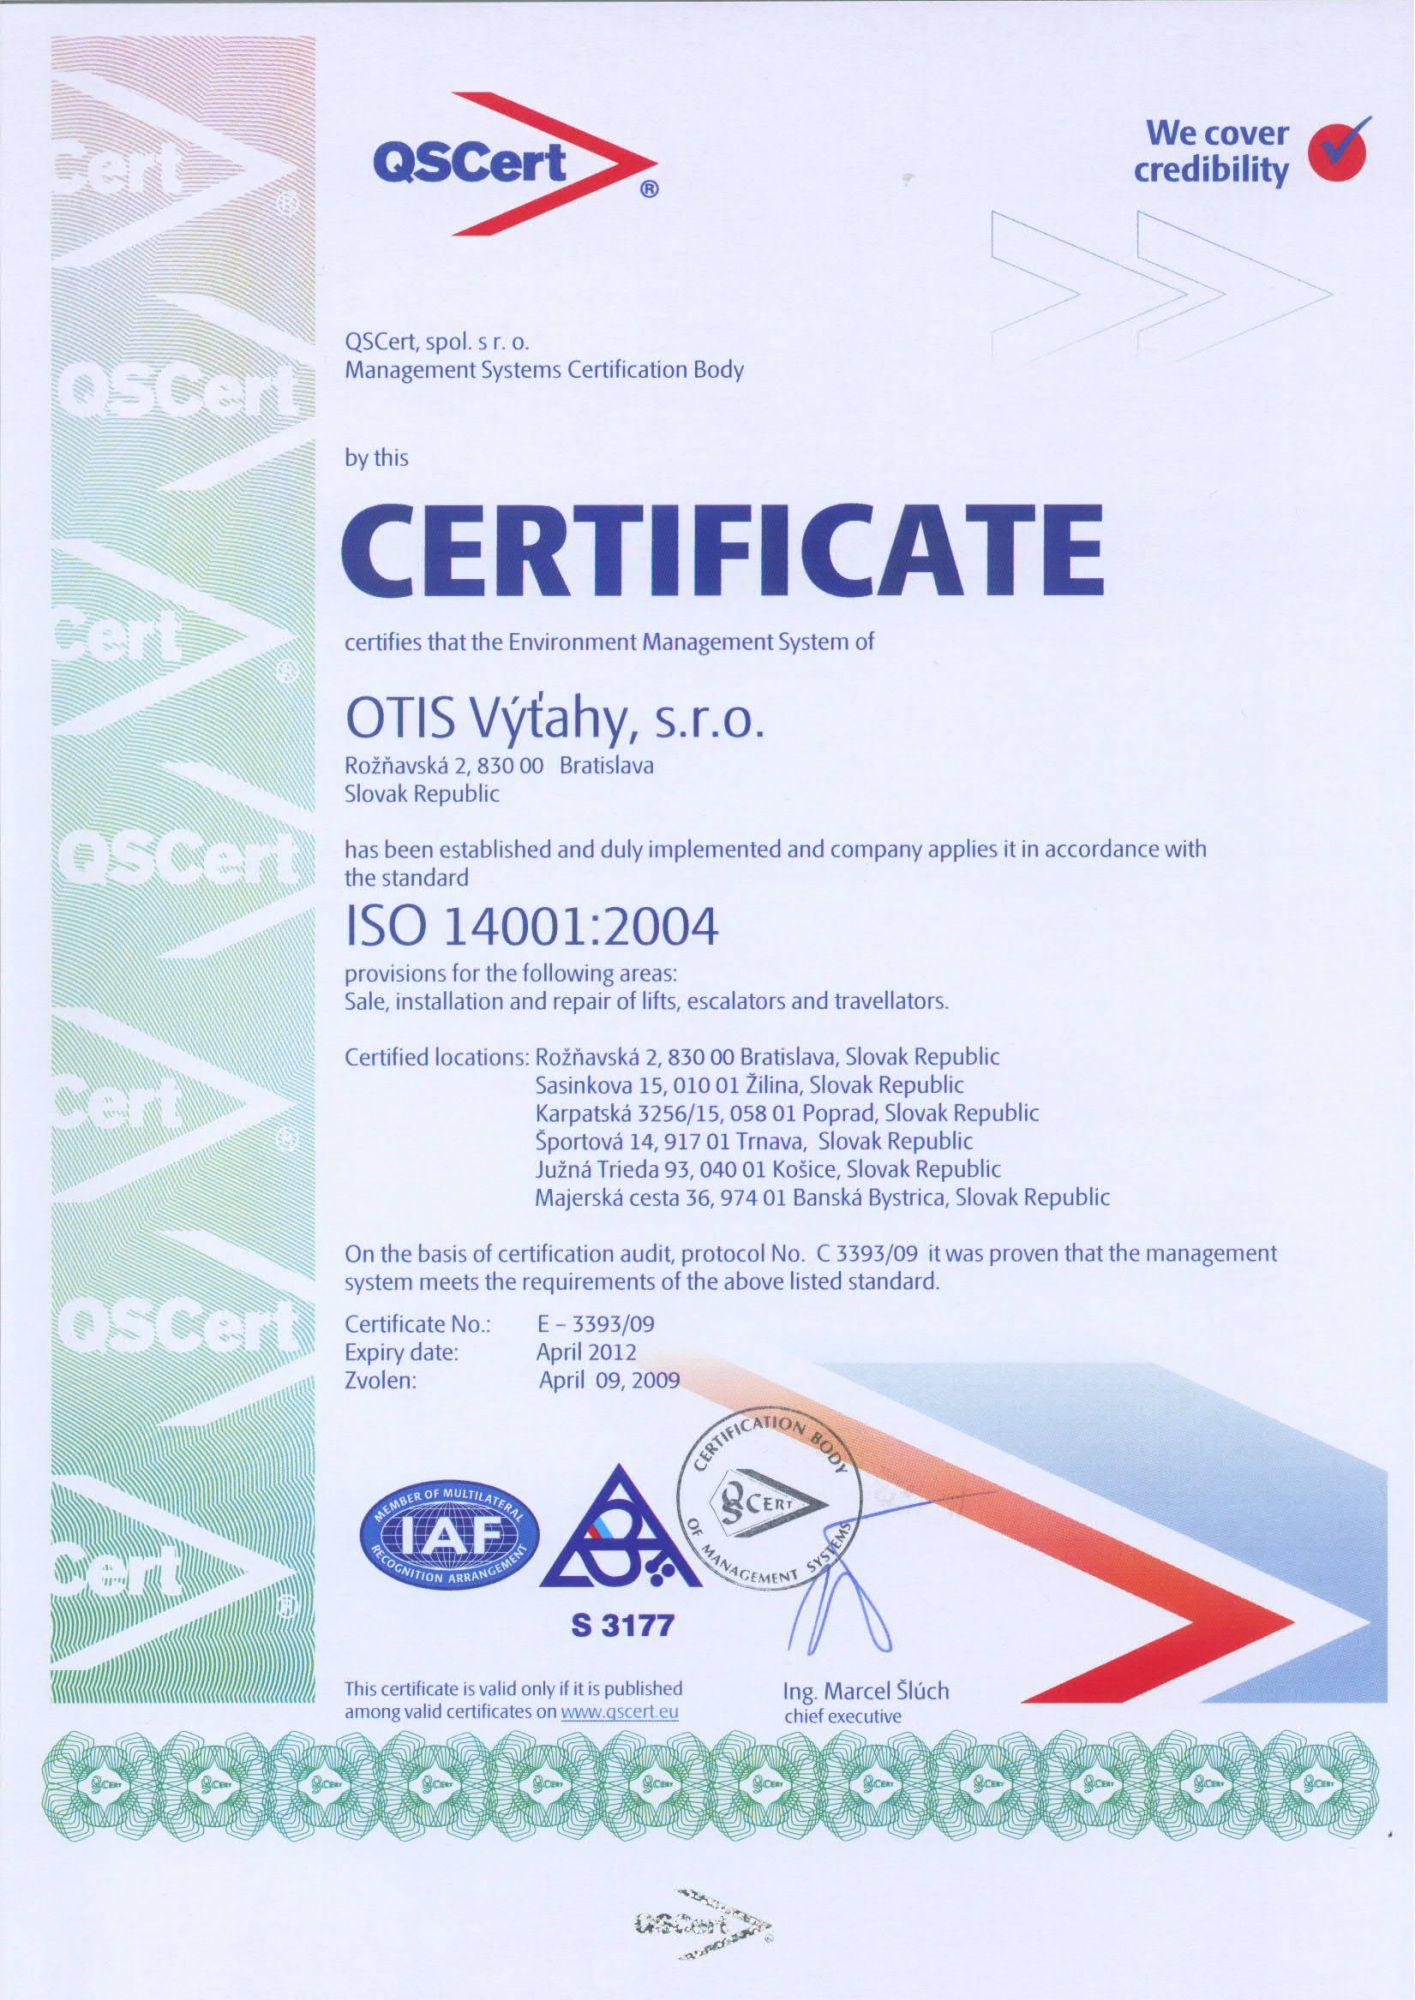 Iso 14001 qscert example certificate iso 14001 xflitez Choice Image